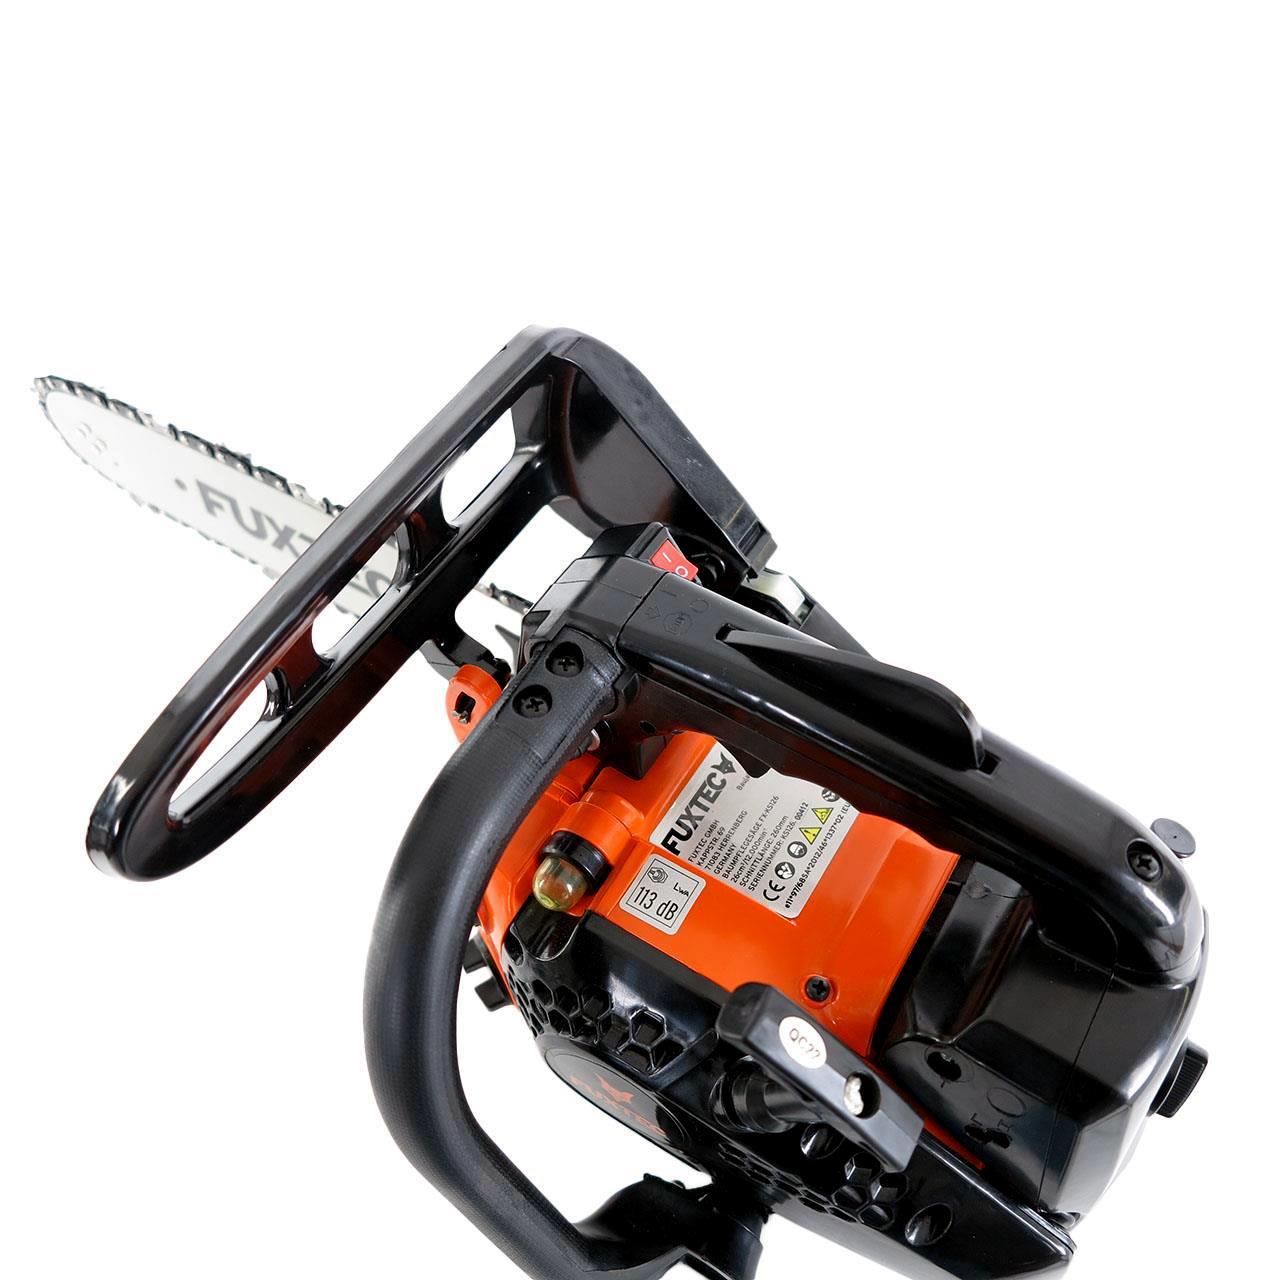 FUXTEC Benzin Baumpflegesäge Kettensäge FX-KS126